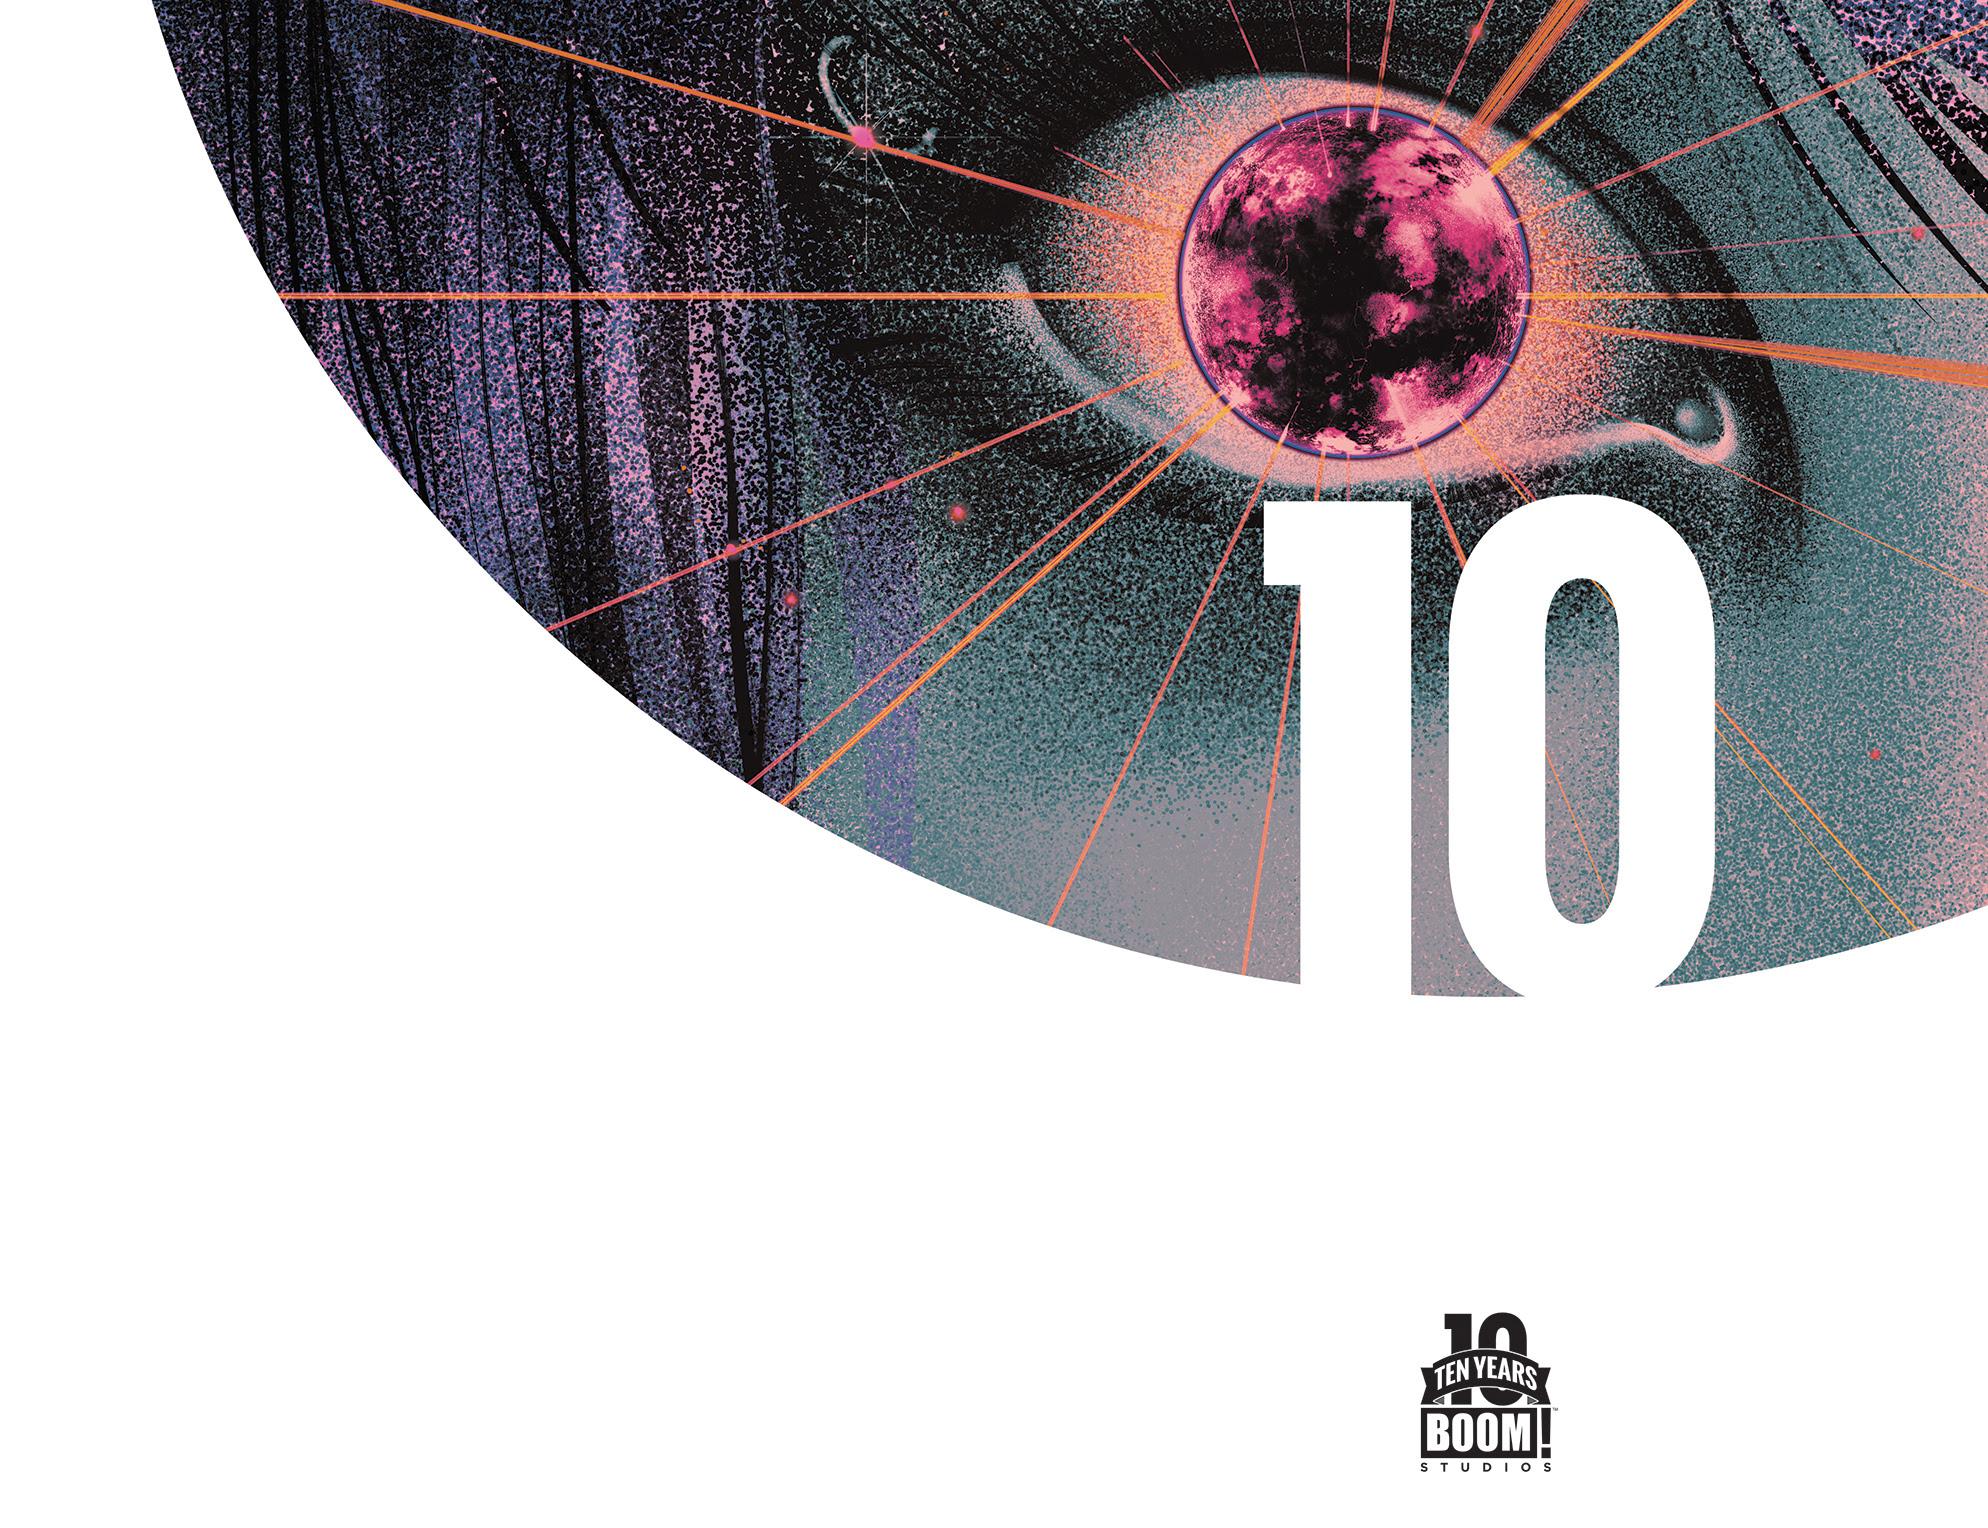 Broken World #1 10 Years Cover